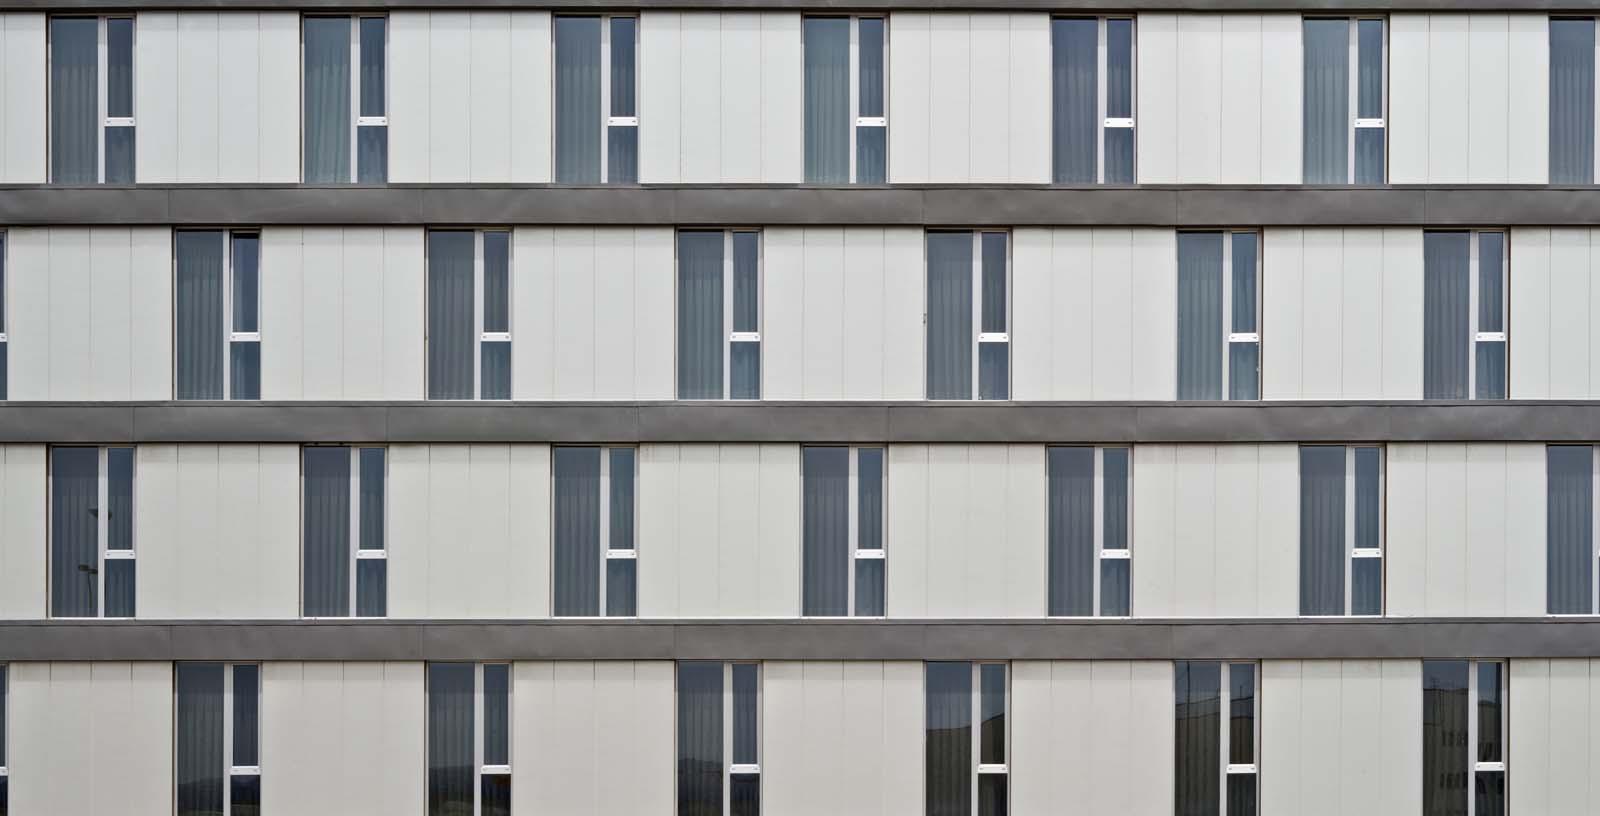 Diagonal_Plaza_Hotel_02_Architecture_Idom_photos_Aitor_Ortiz